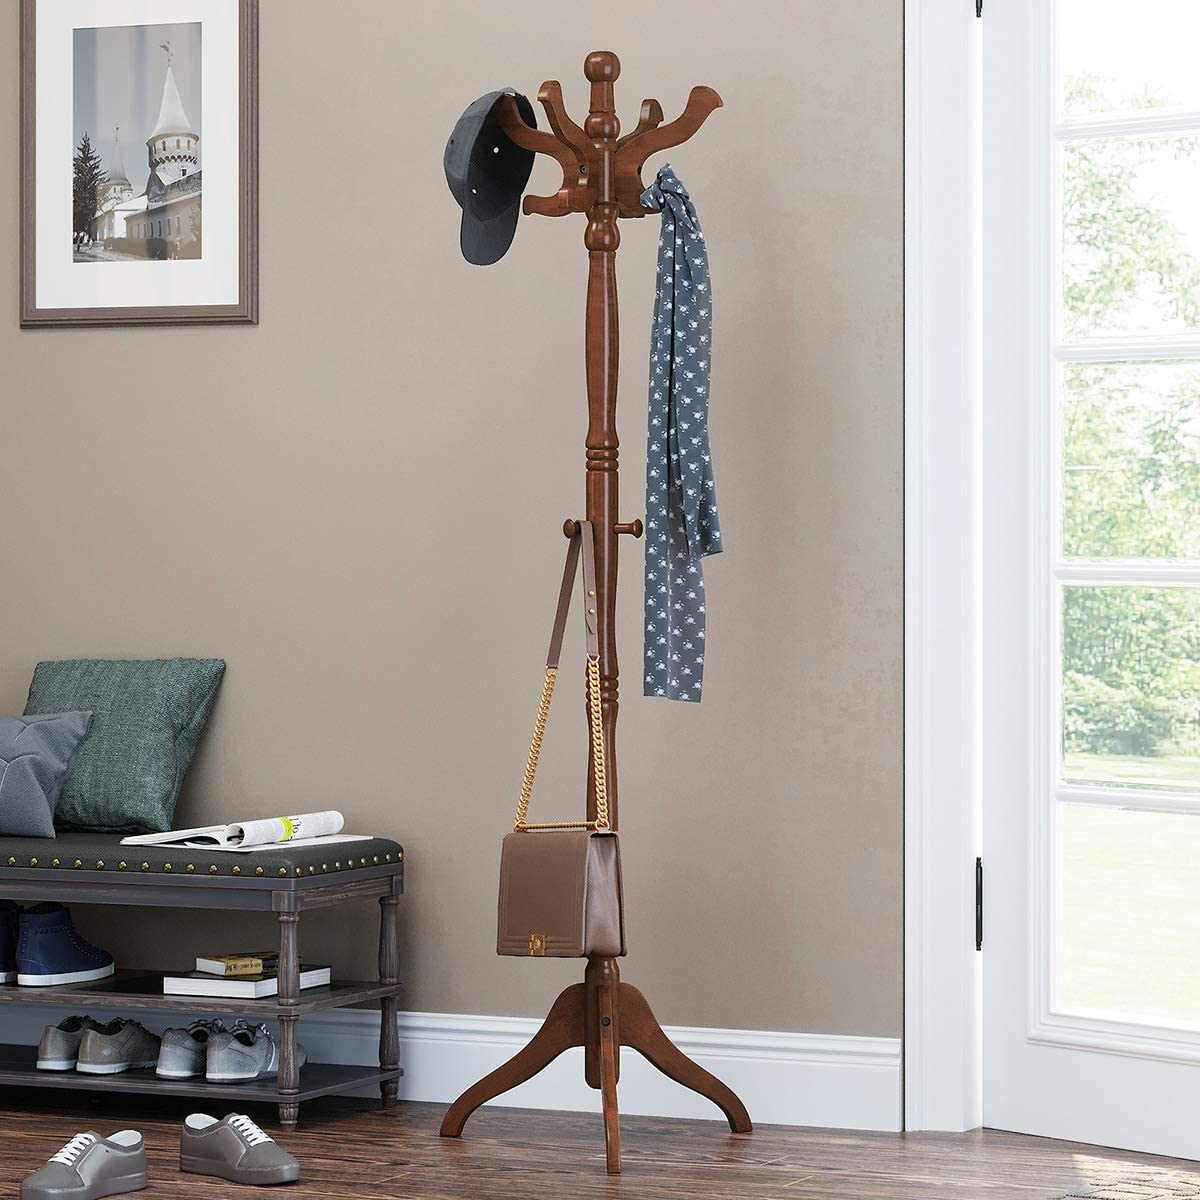 VASAGLE Coat Rack Free Standing with 11 Hooks, Wooden Hall Tree Coat Hat Tree Coat Holder with Solid Rubberwood Base for Coat, Hat, Clothes, Scarves, Handbags, Umbrella, Dark Walnut URCR05WN